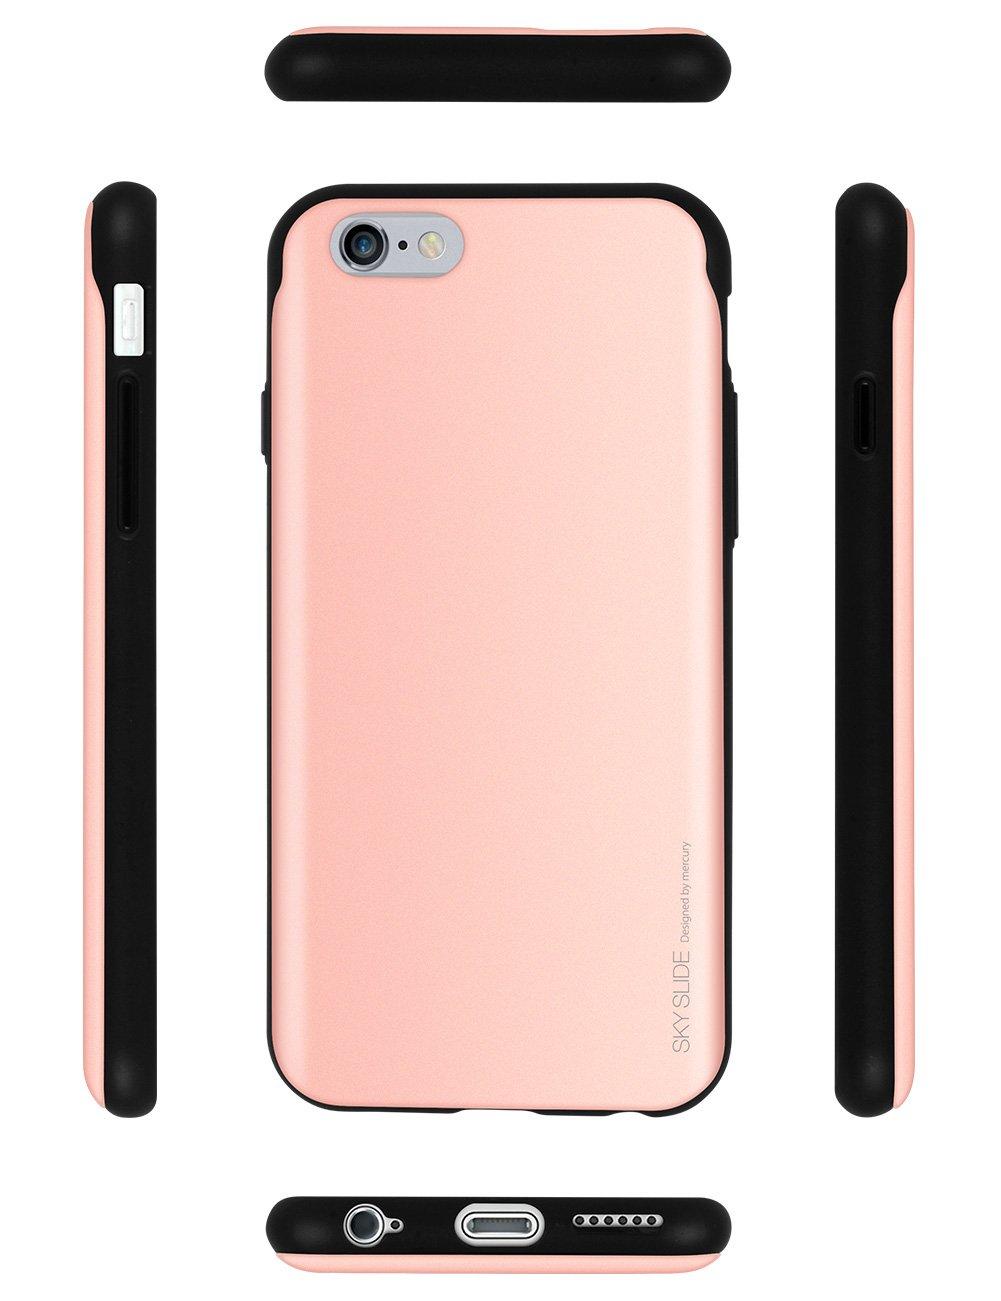 Harga Jual Goospery Iphone 6 6s Sky Slide Bumper Case Silver 8 Hotpink Sliding Card Holder Protective Dual Layer Tpu